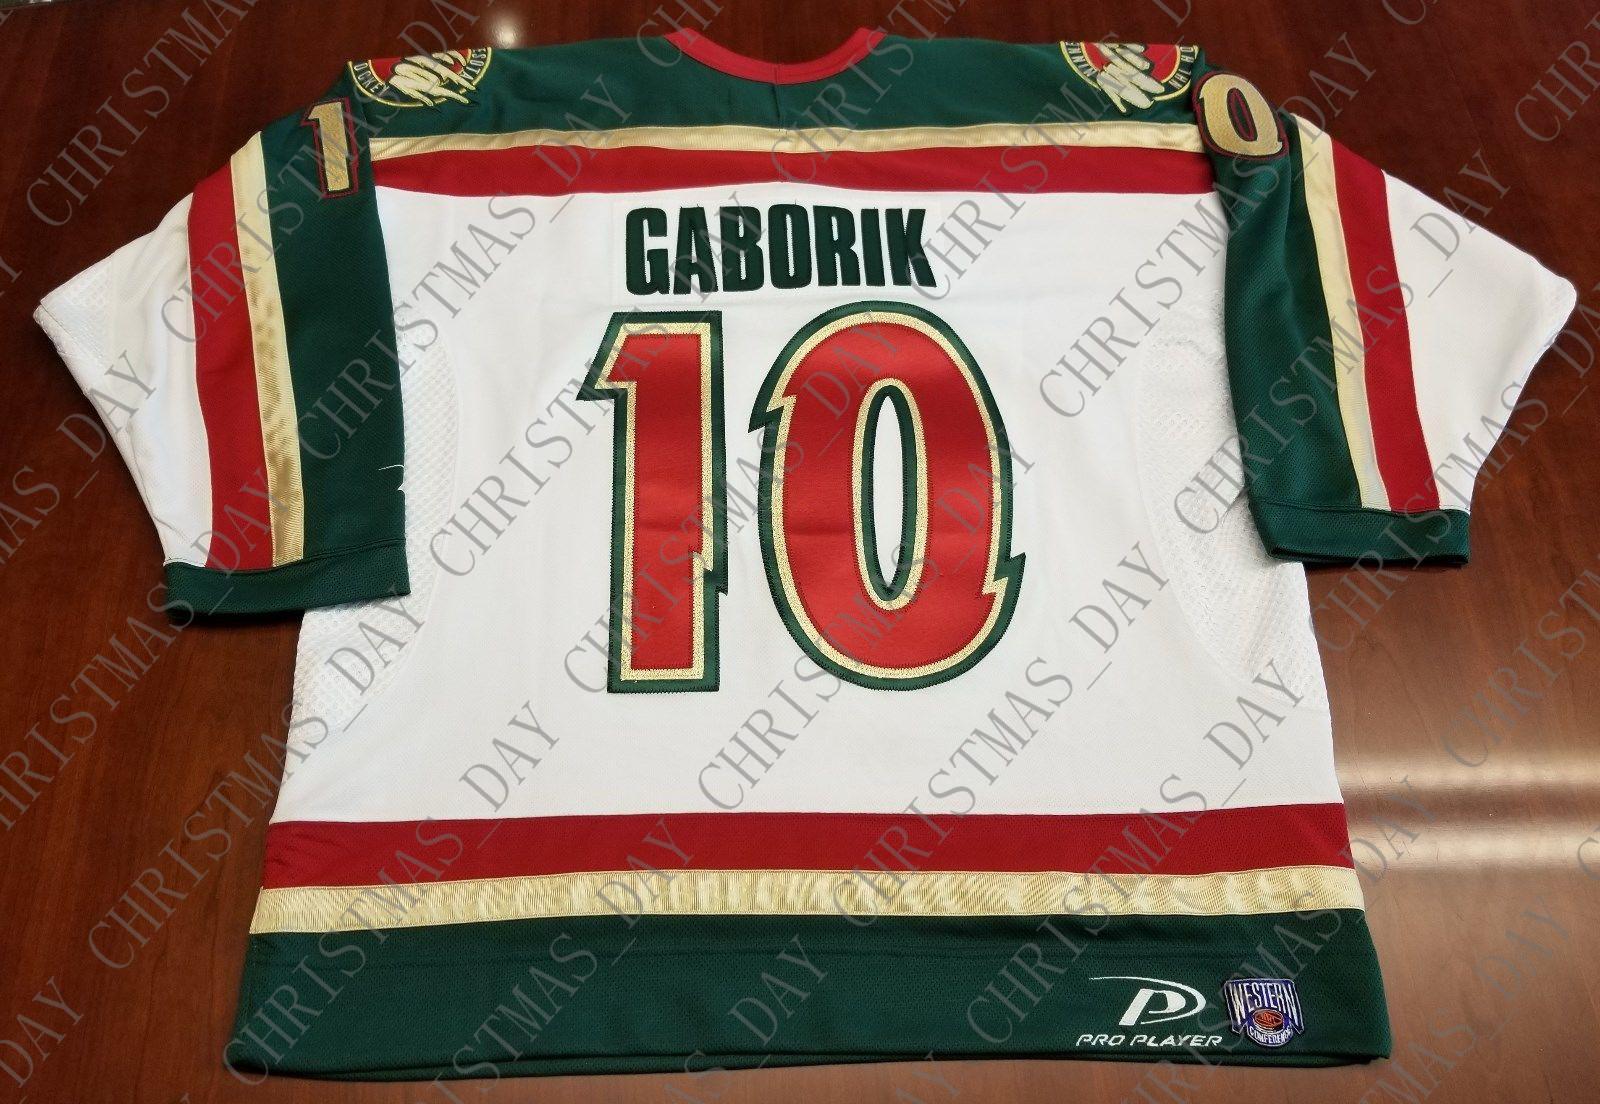 wholesale dealer 8cde6 7d744 Cheap custom Marian Gaborik Vintage Minnesota Wild Pro Player Jersey  Stitched Retro Hockey Jersey XS-5XL